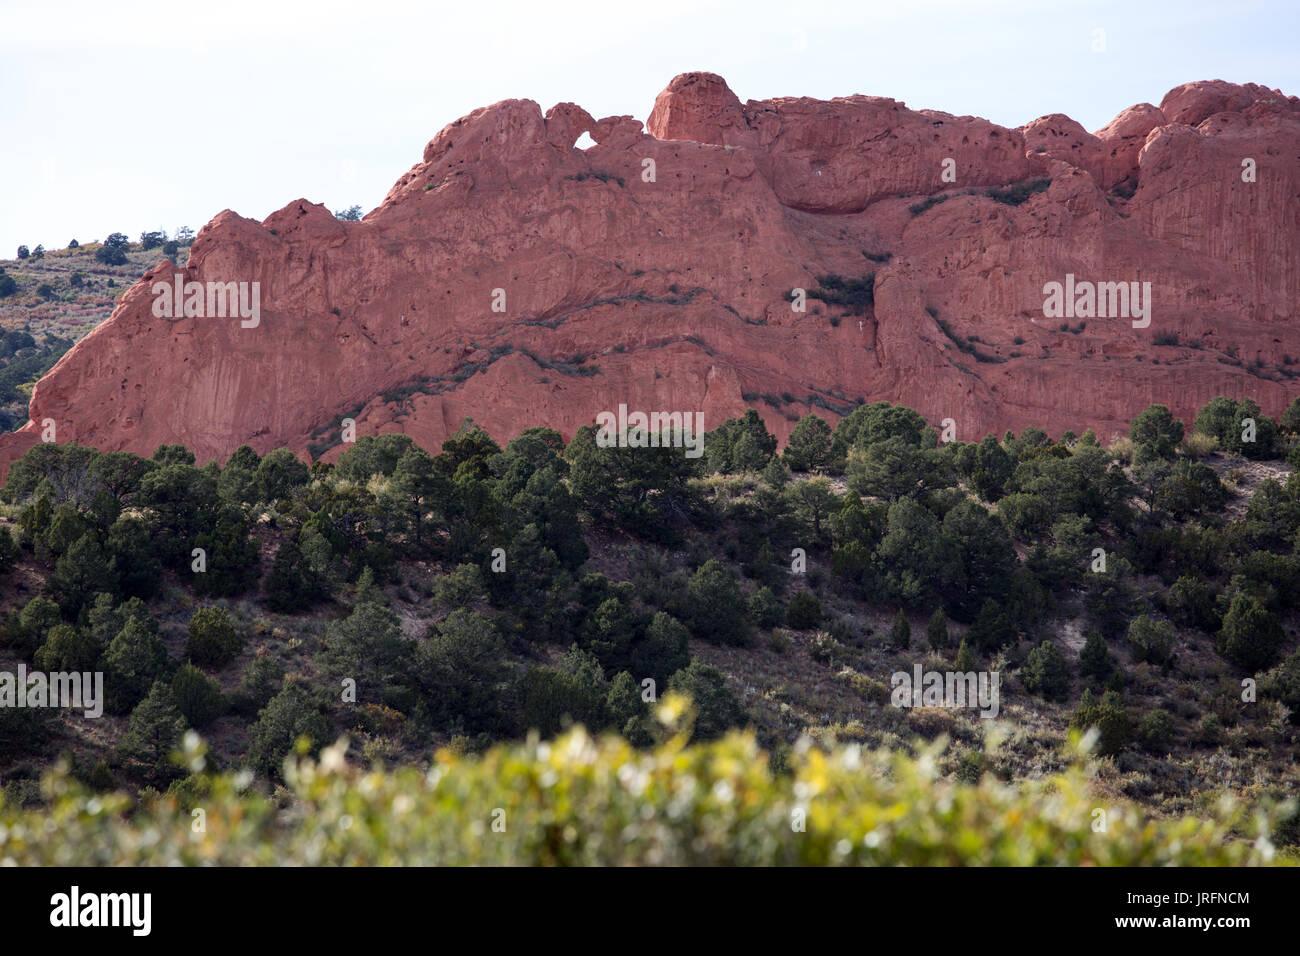 Garden of the gods national park, Colorado Springs - Stock Image